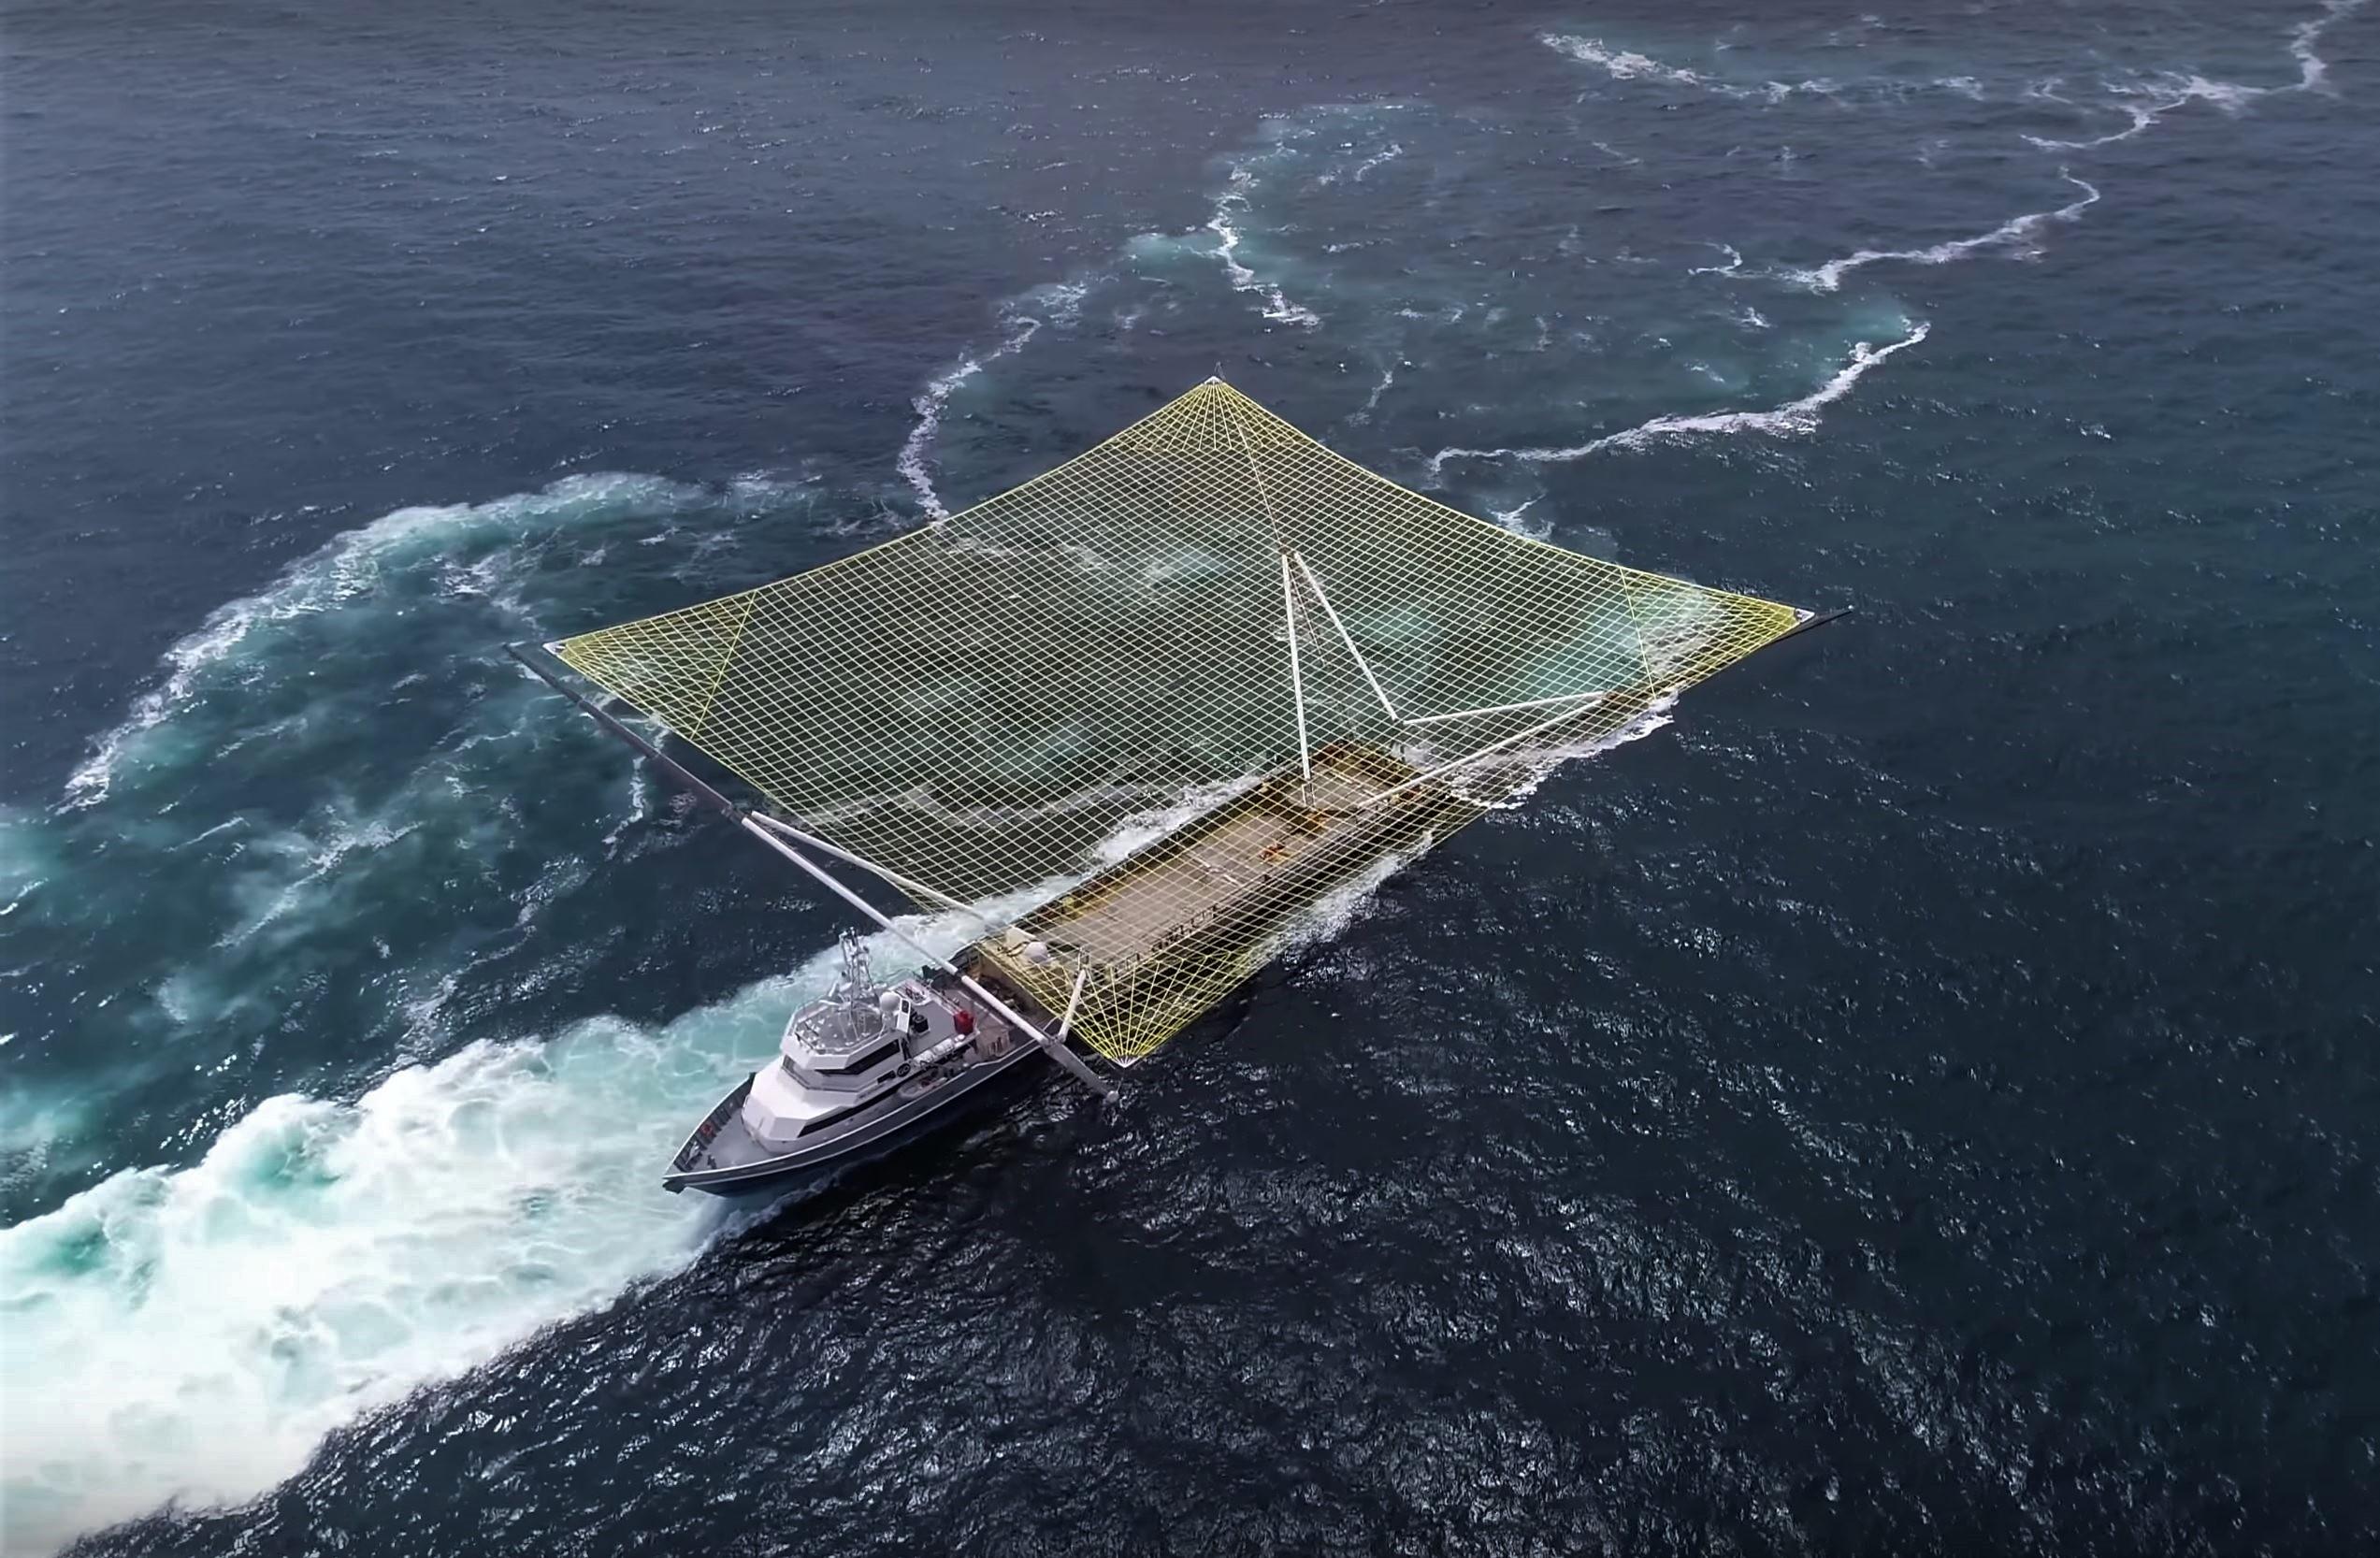 Mr Steven new net sea trials July 2018 6